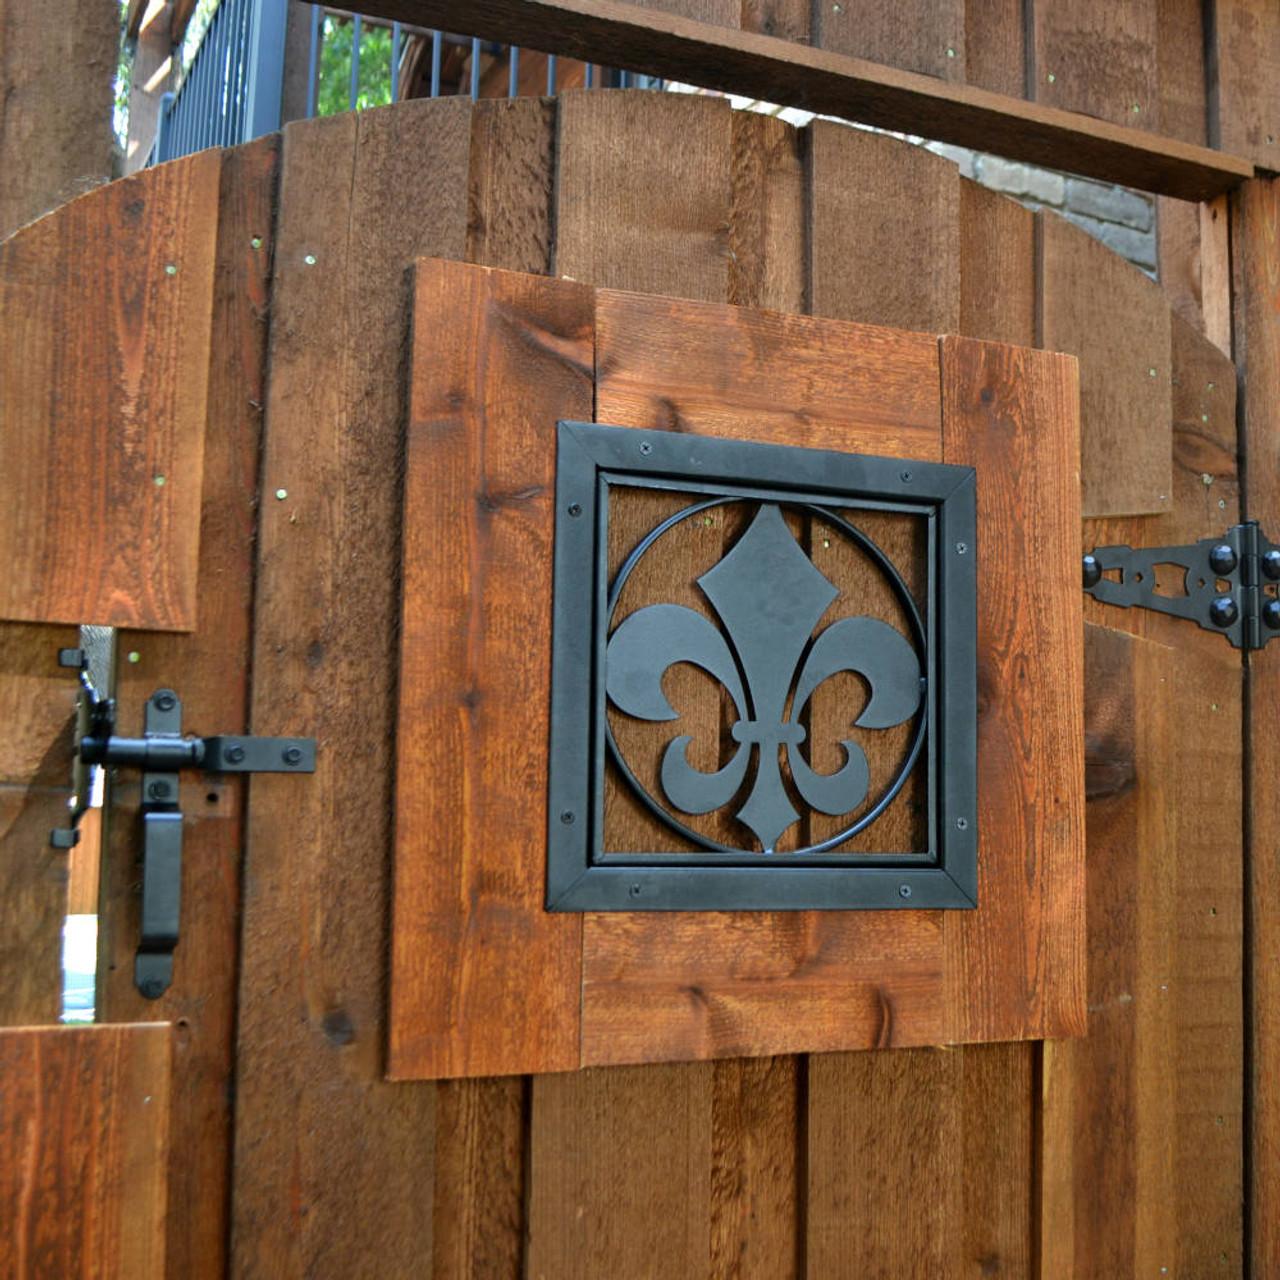 OZCO OWT Hardware Fleur-De-Lis Gate Accent Surface Mounted on Wood Gate